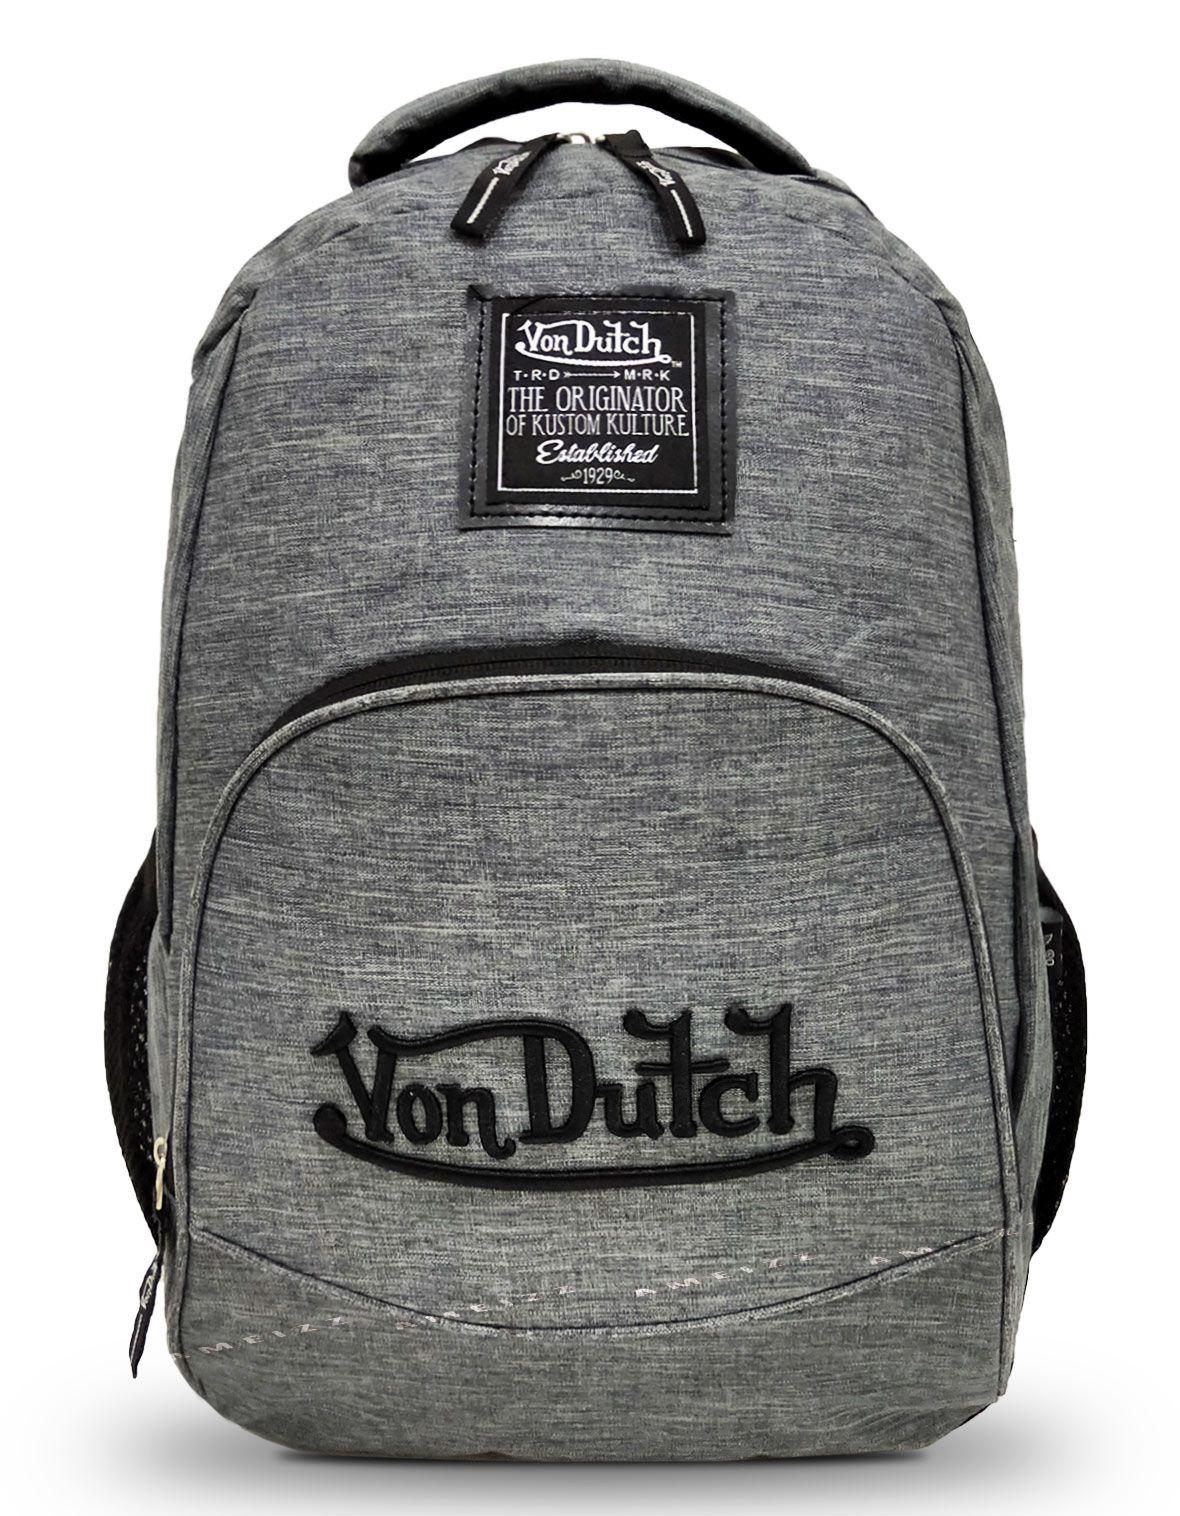 Mochila Backpack Von Dutch 183009 Juvenil Resistente Cinza